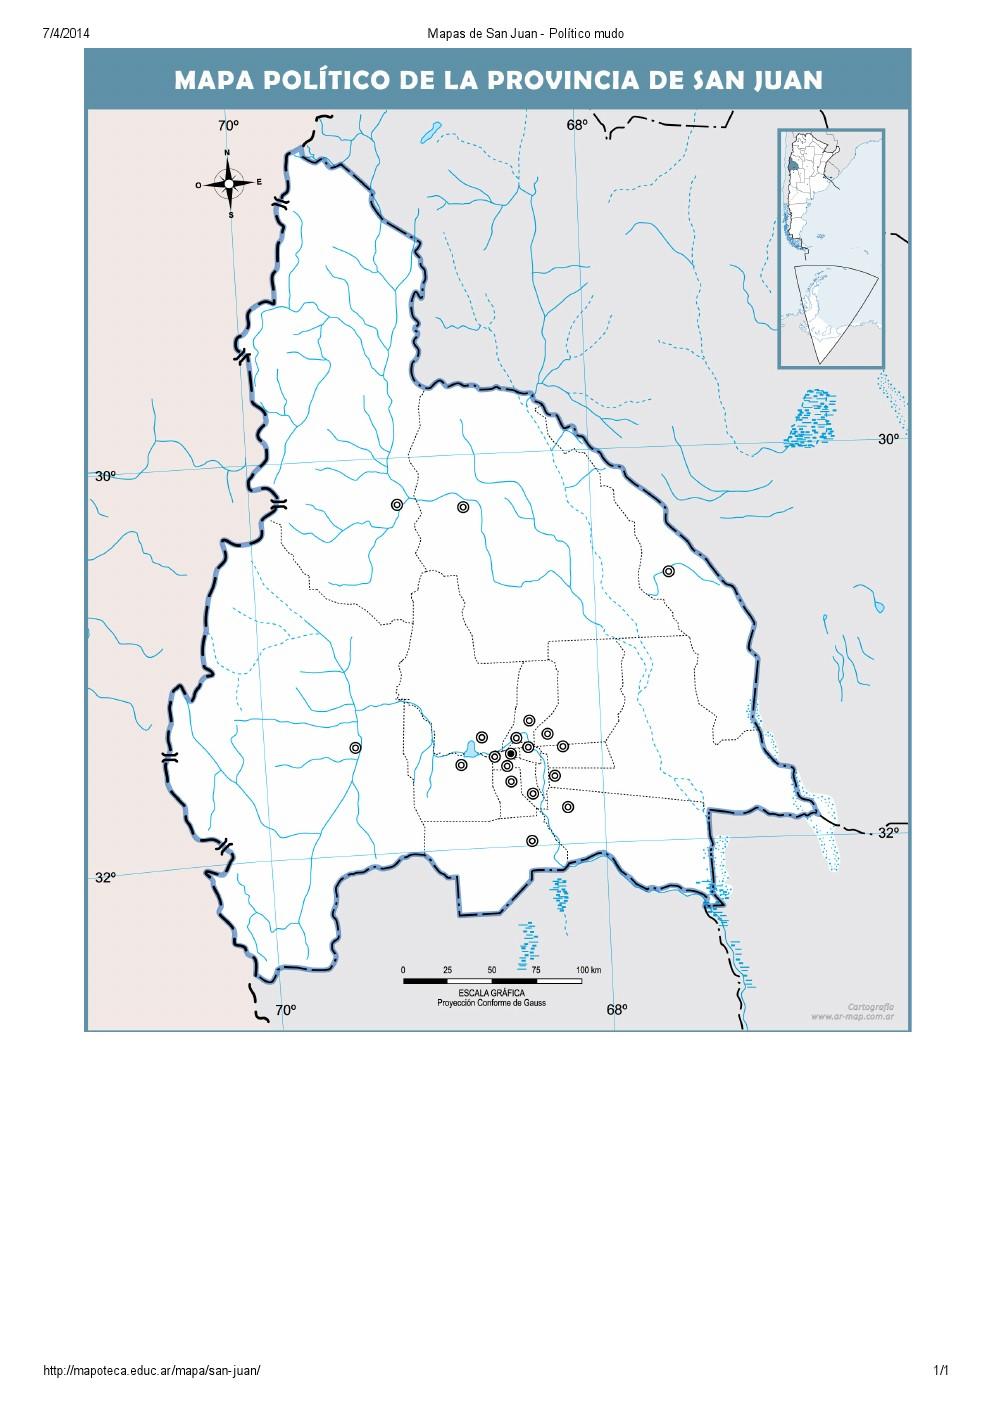 Mapa mudo de capitales de San Juan. Mapoteca de Educ.ar